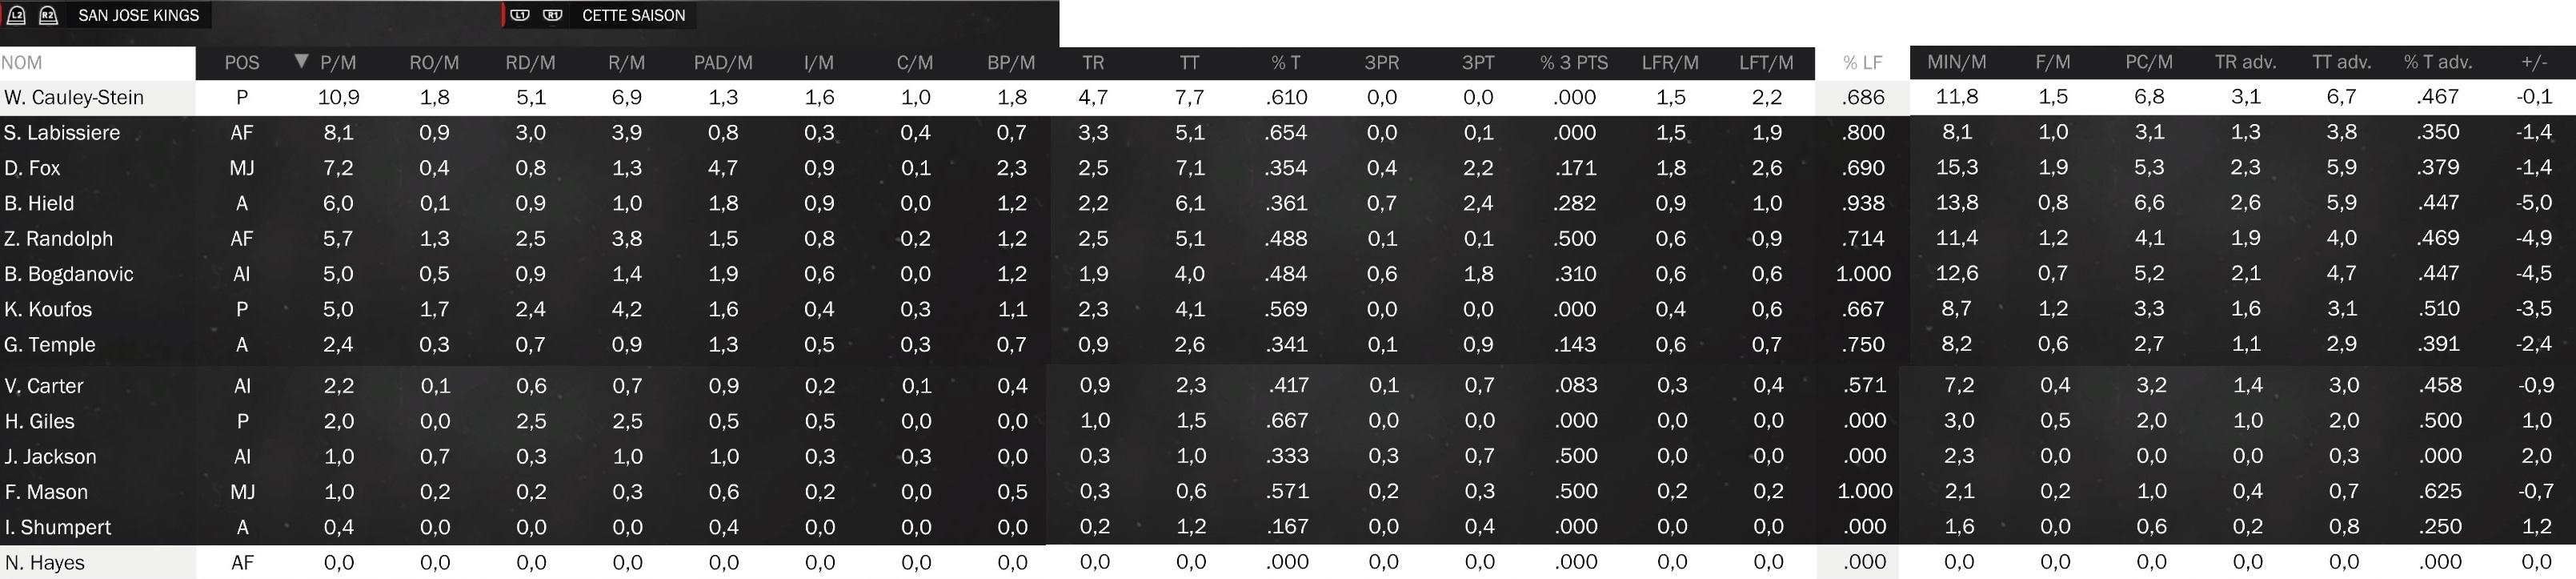 Statistiques individuelles Kings10